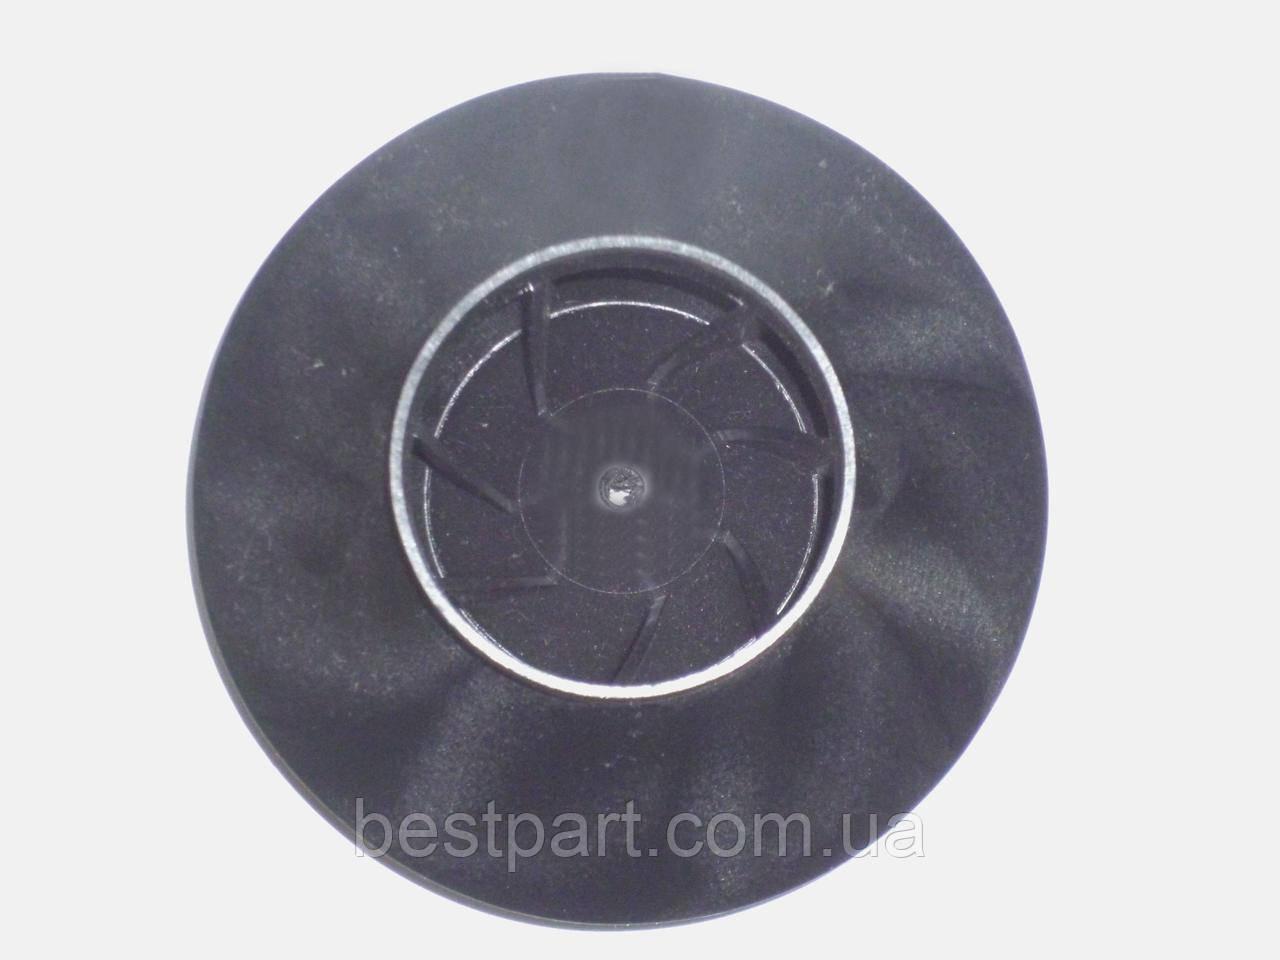 Крильчатка вентилятора, код: сб.2593